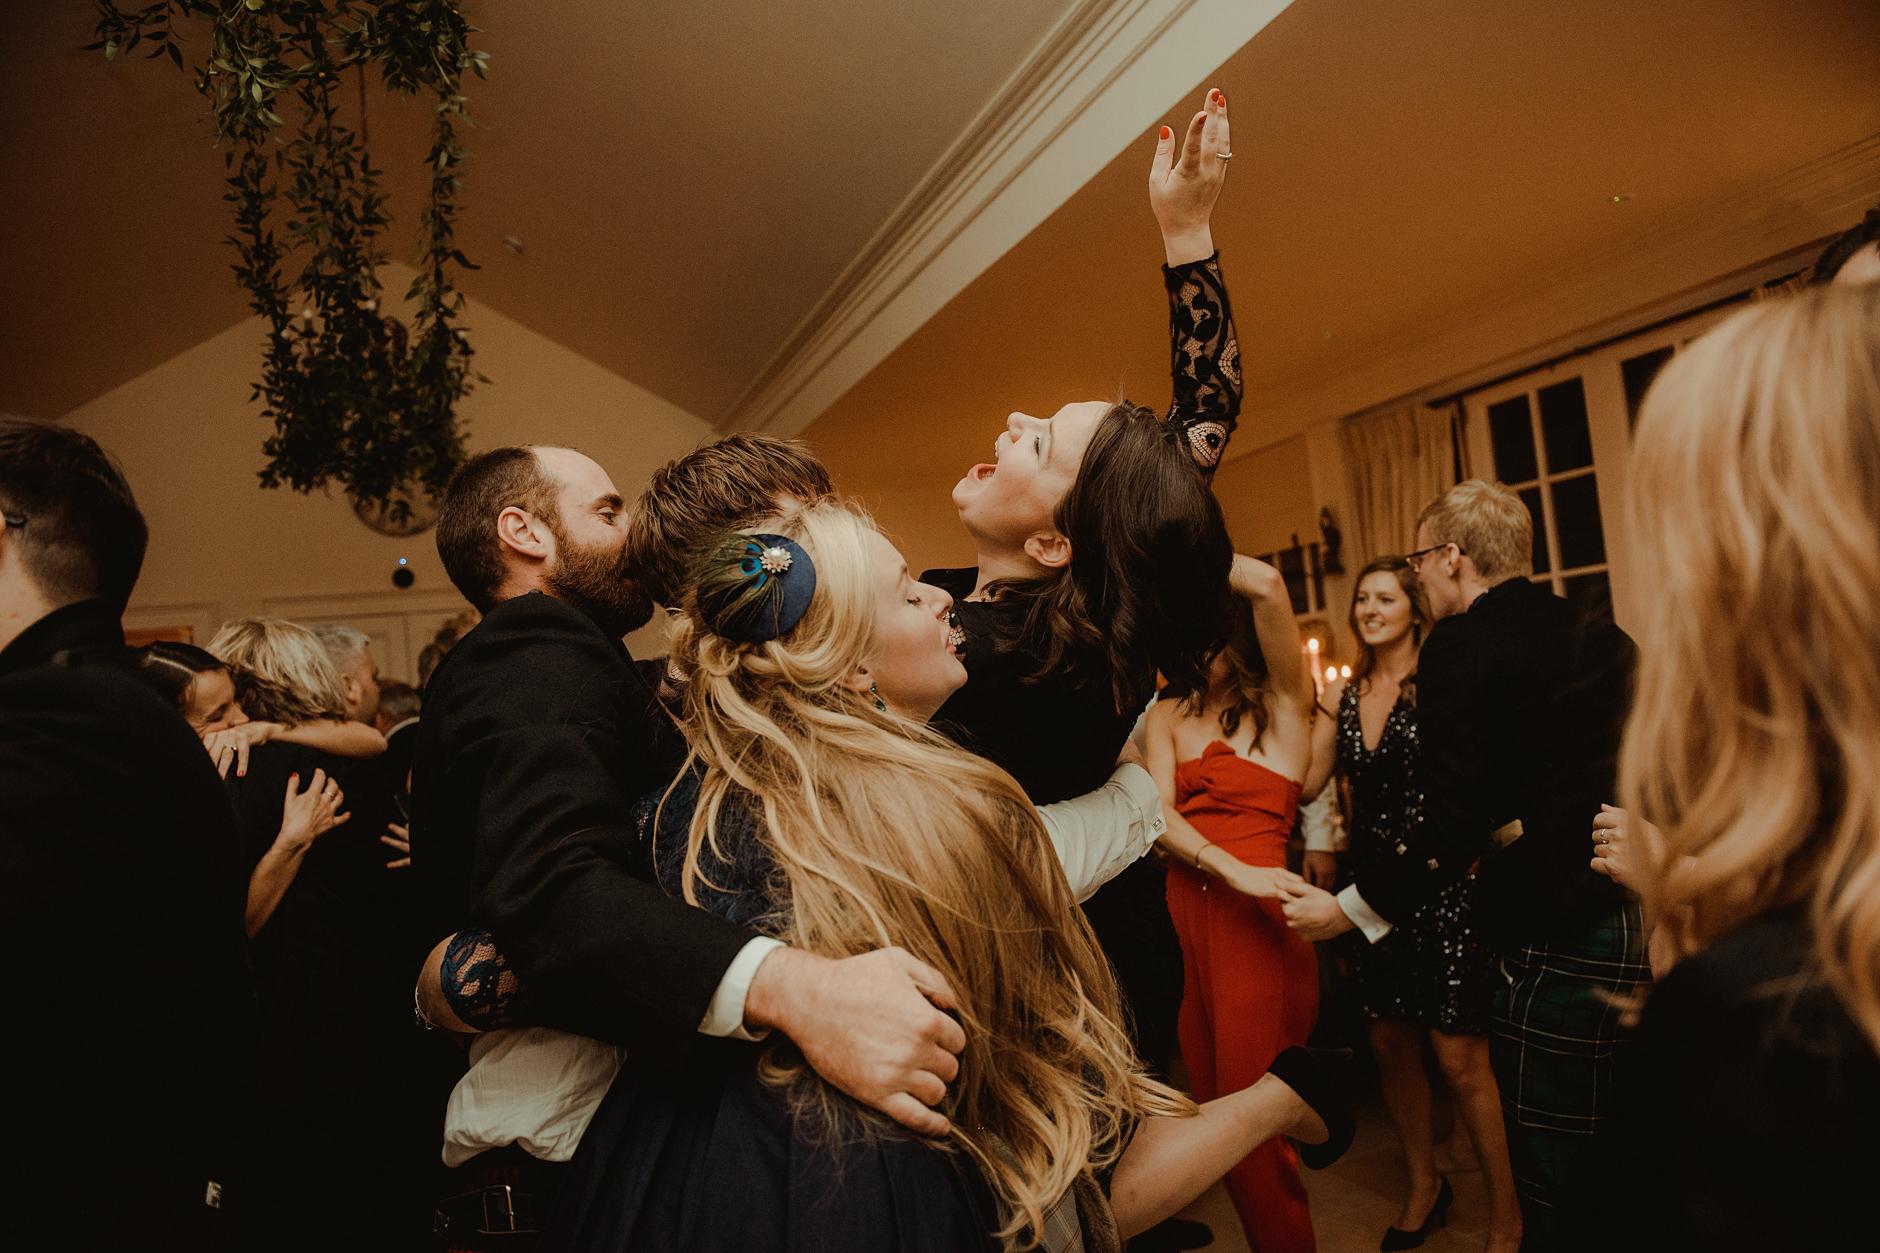 Glentruim-Wedding-Nikki-Leadbetter-Photography-369.jpg